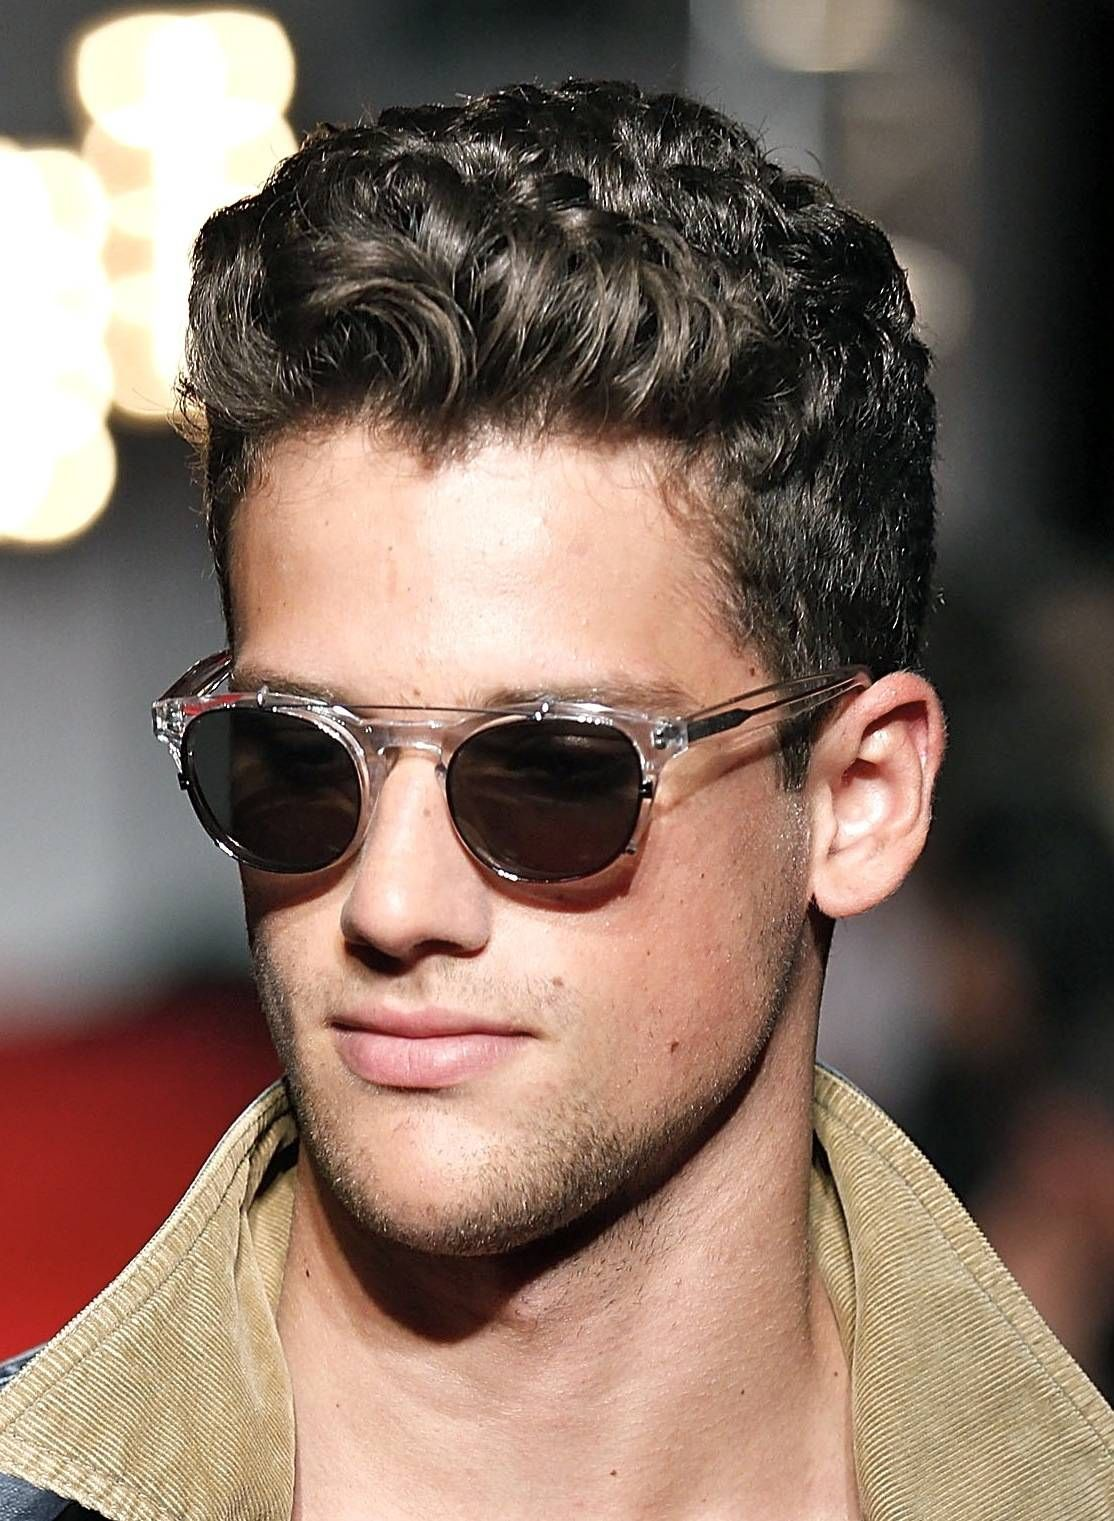 Curly boy hair black  cool curly hairstyles for men  boy hair  pinterest  short